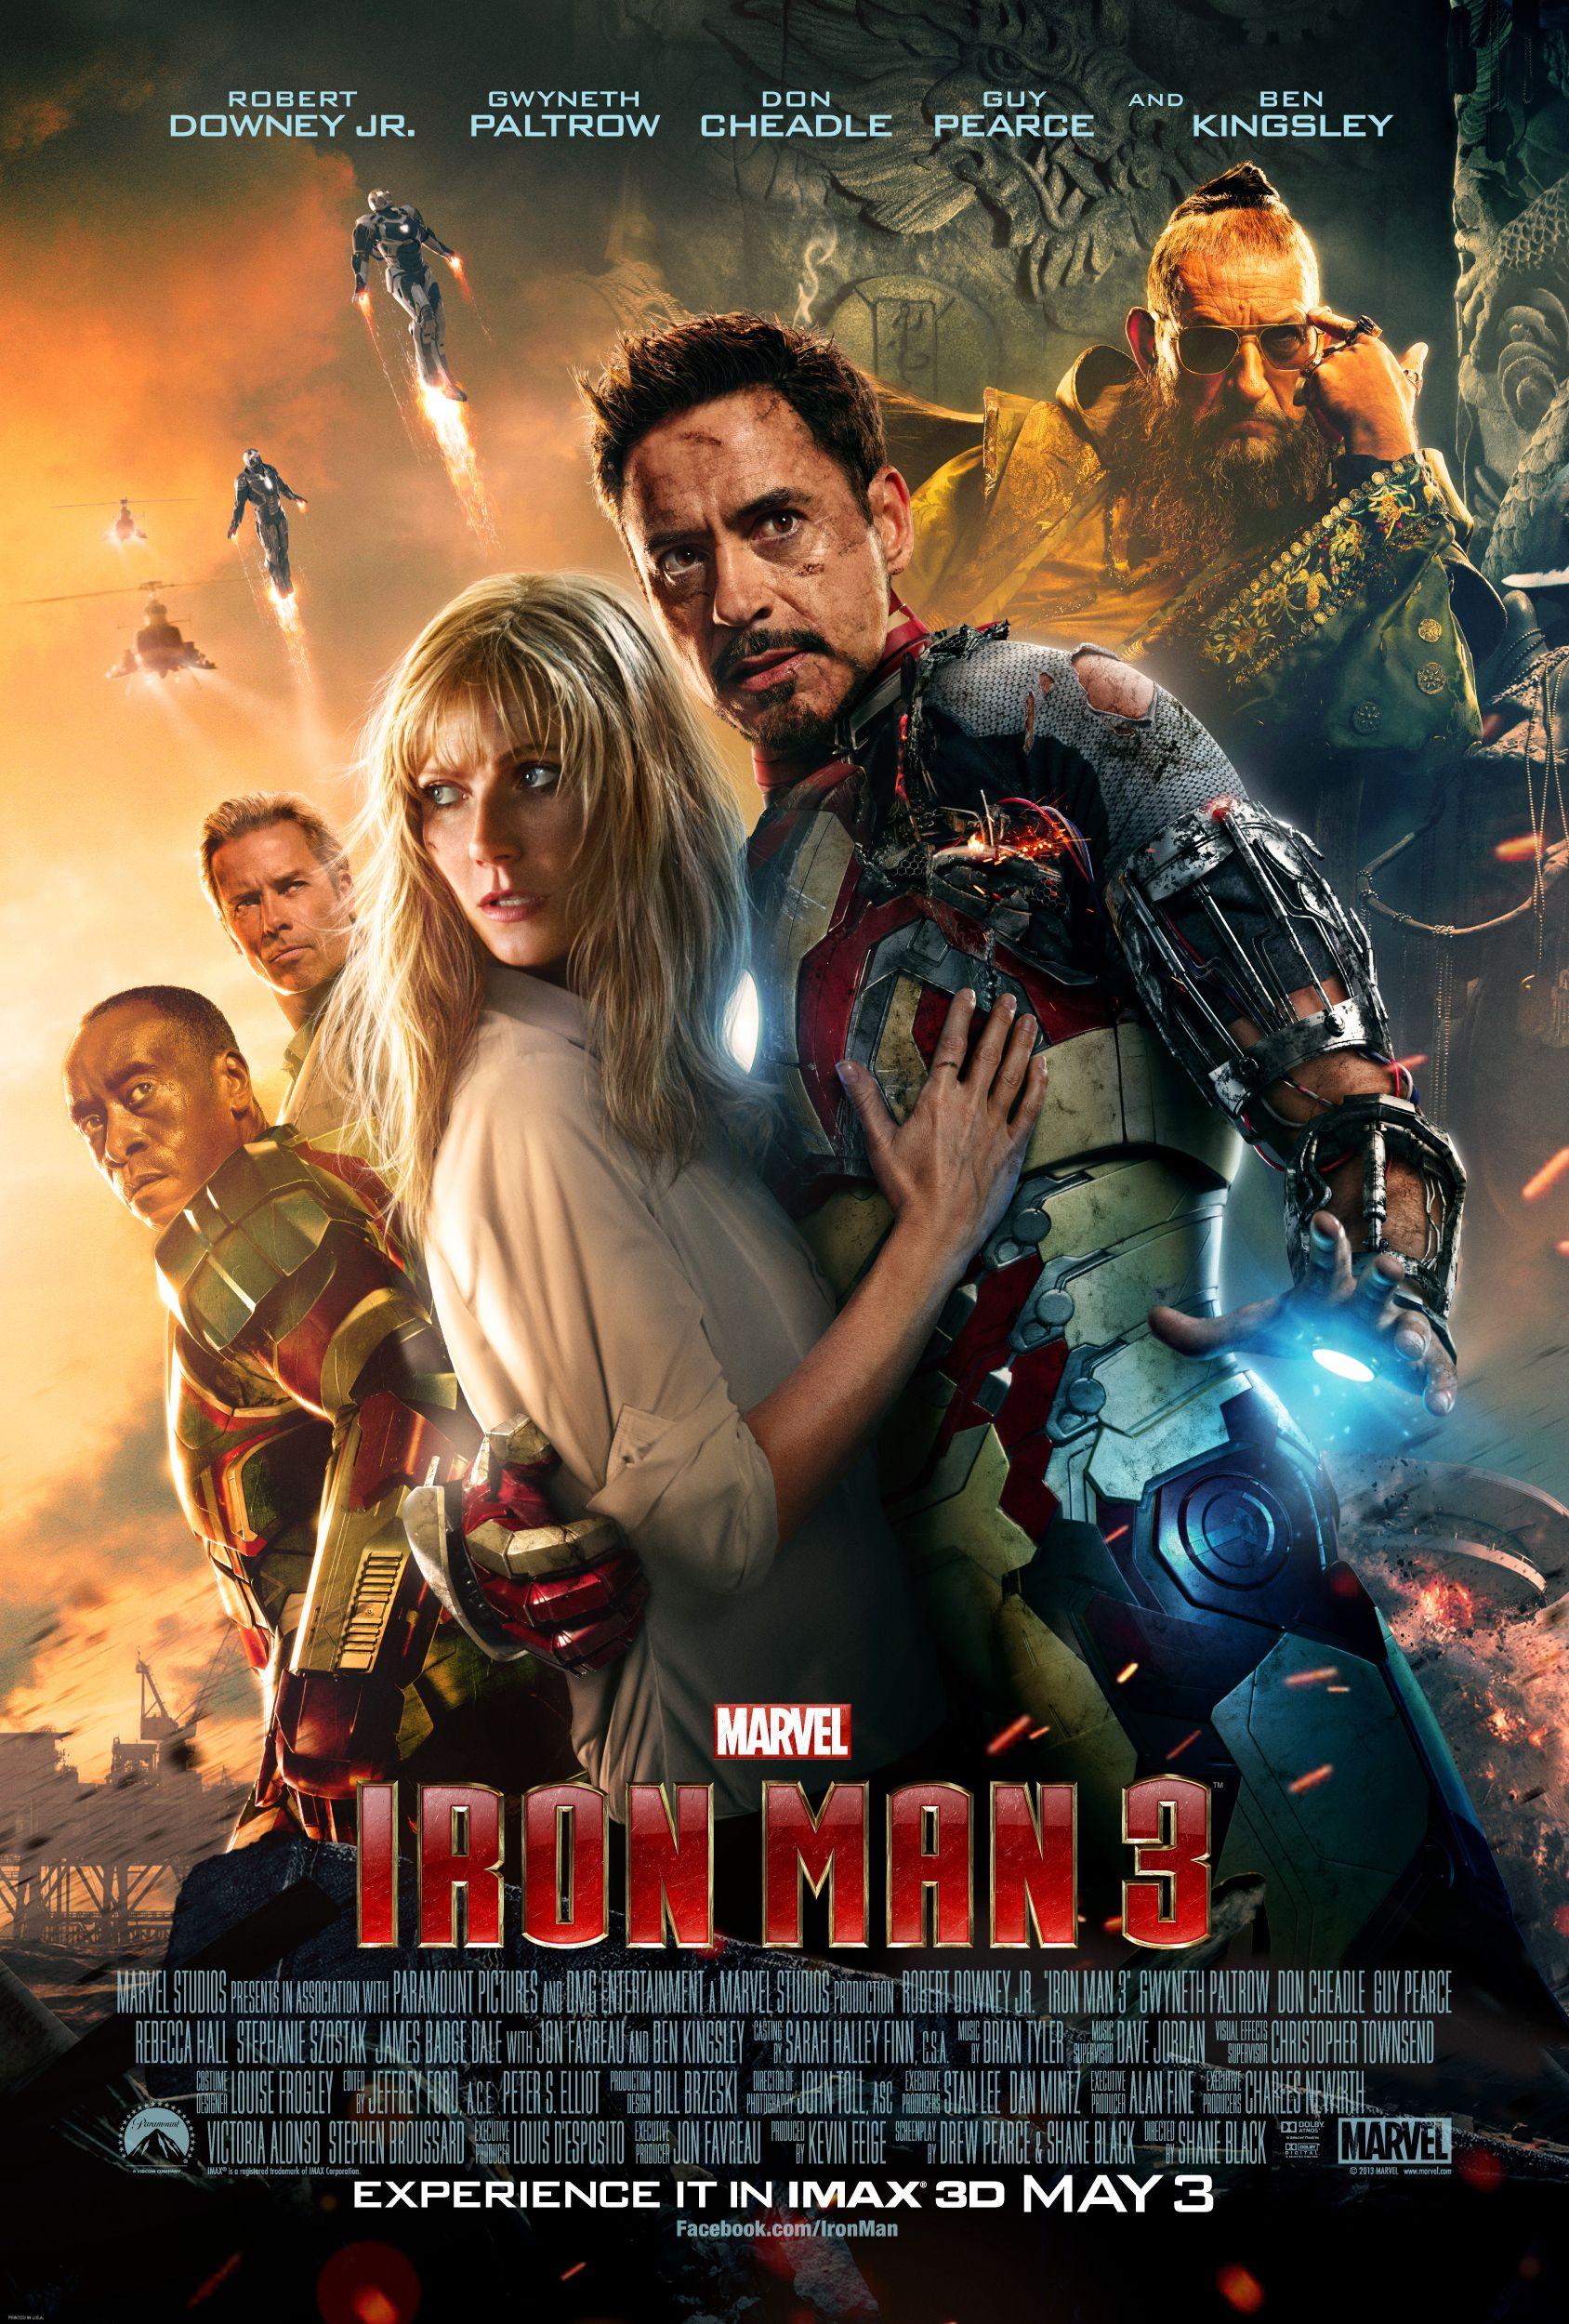 Iron man 3 imax movie poster ironman3 iron man 3 poster